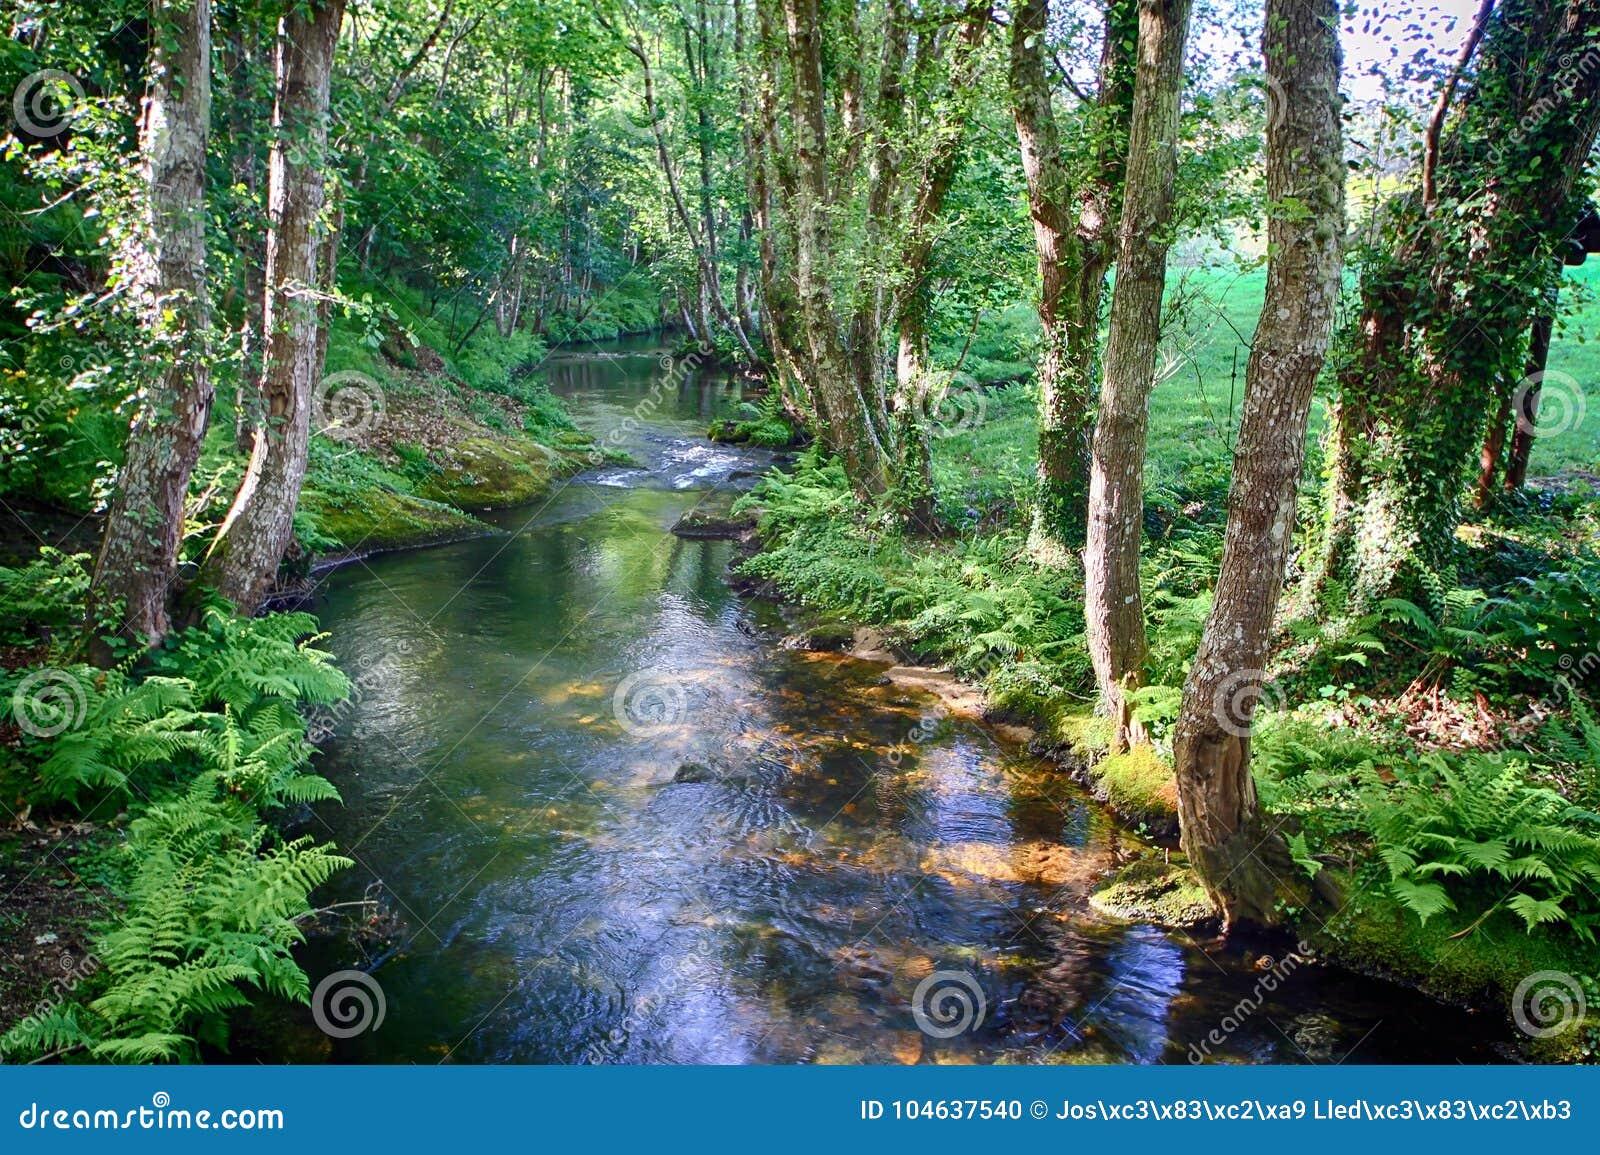 Download Salgadelosril En Bos In De Provincie Van Lugo In Spanje Stock Foto - Afbeelding bestaande uit schoonheid, wildernis: 104637540